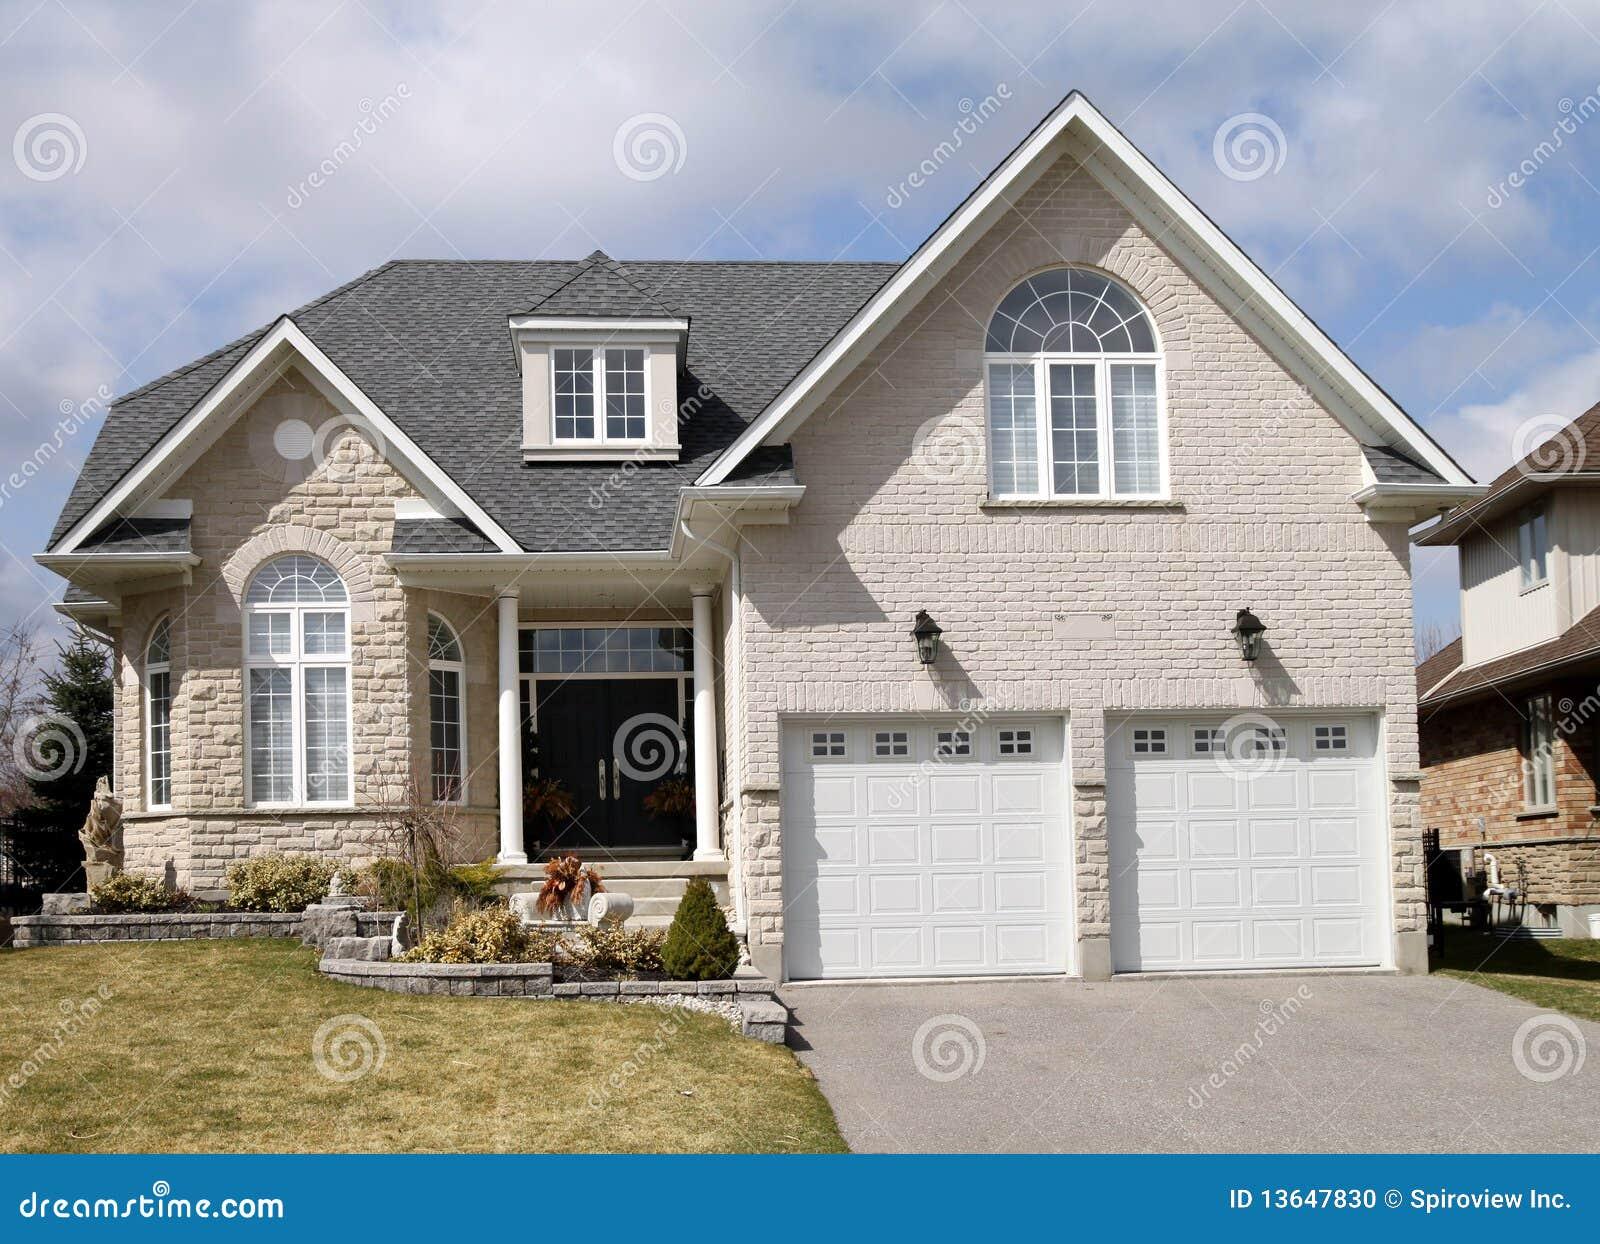 Garage door repair clipart - Large Suburban House Stock Photo Image 13647830